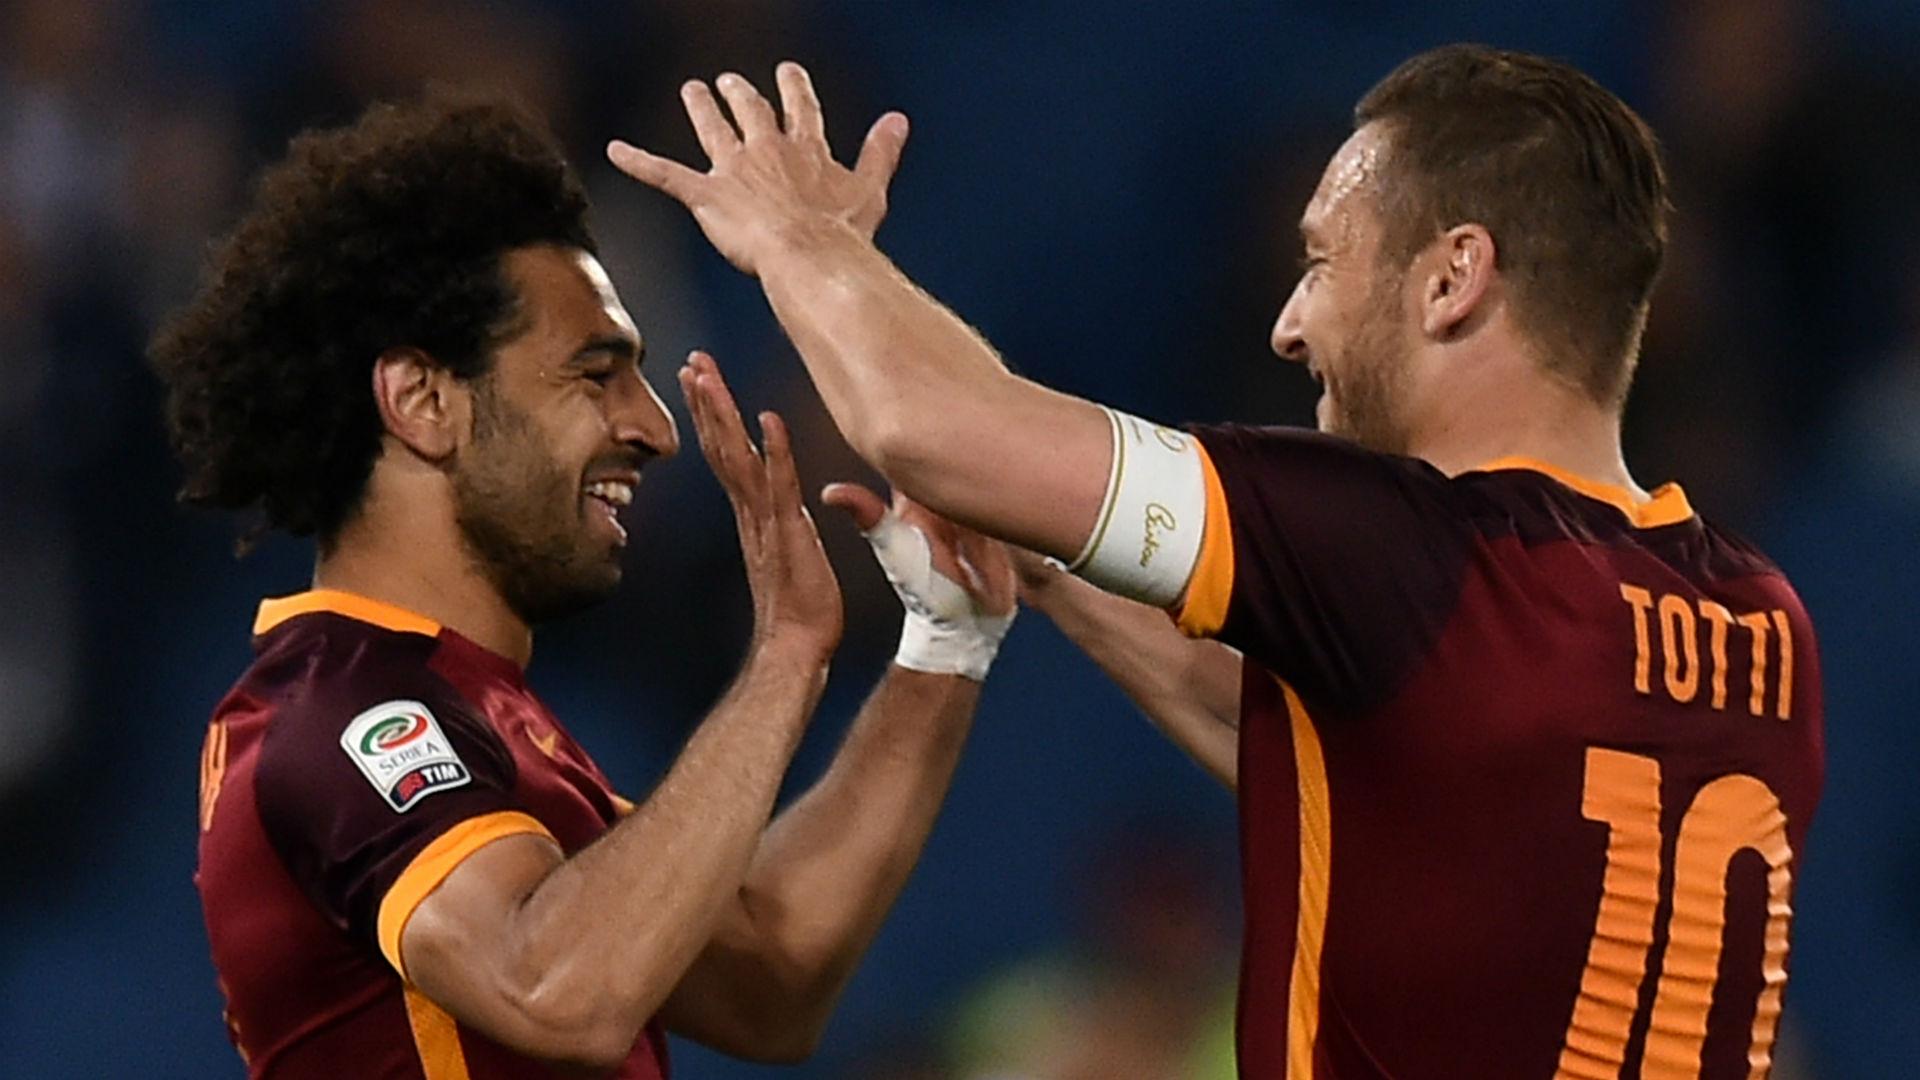 Liverpool's Salah never abandoned Roma - Totti